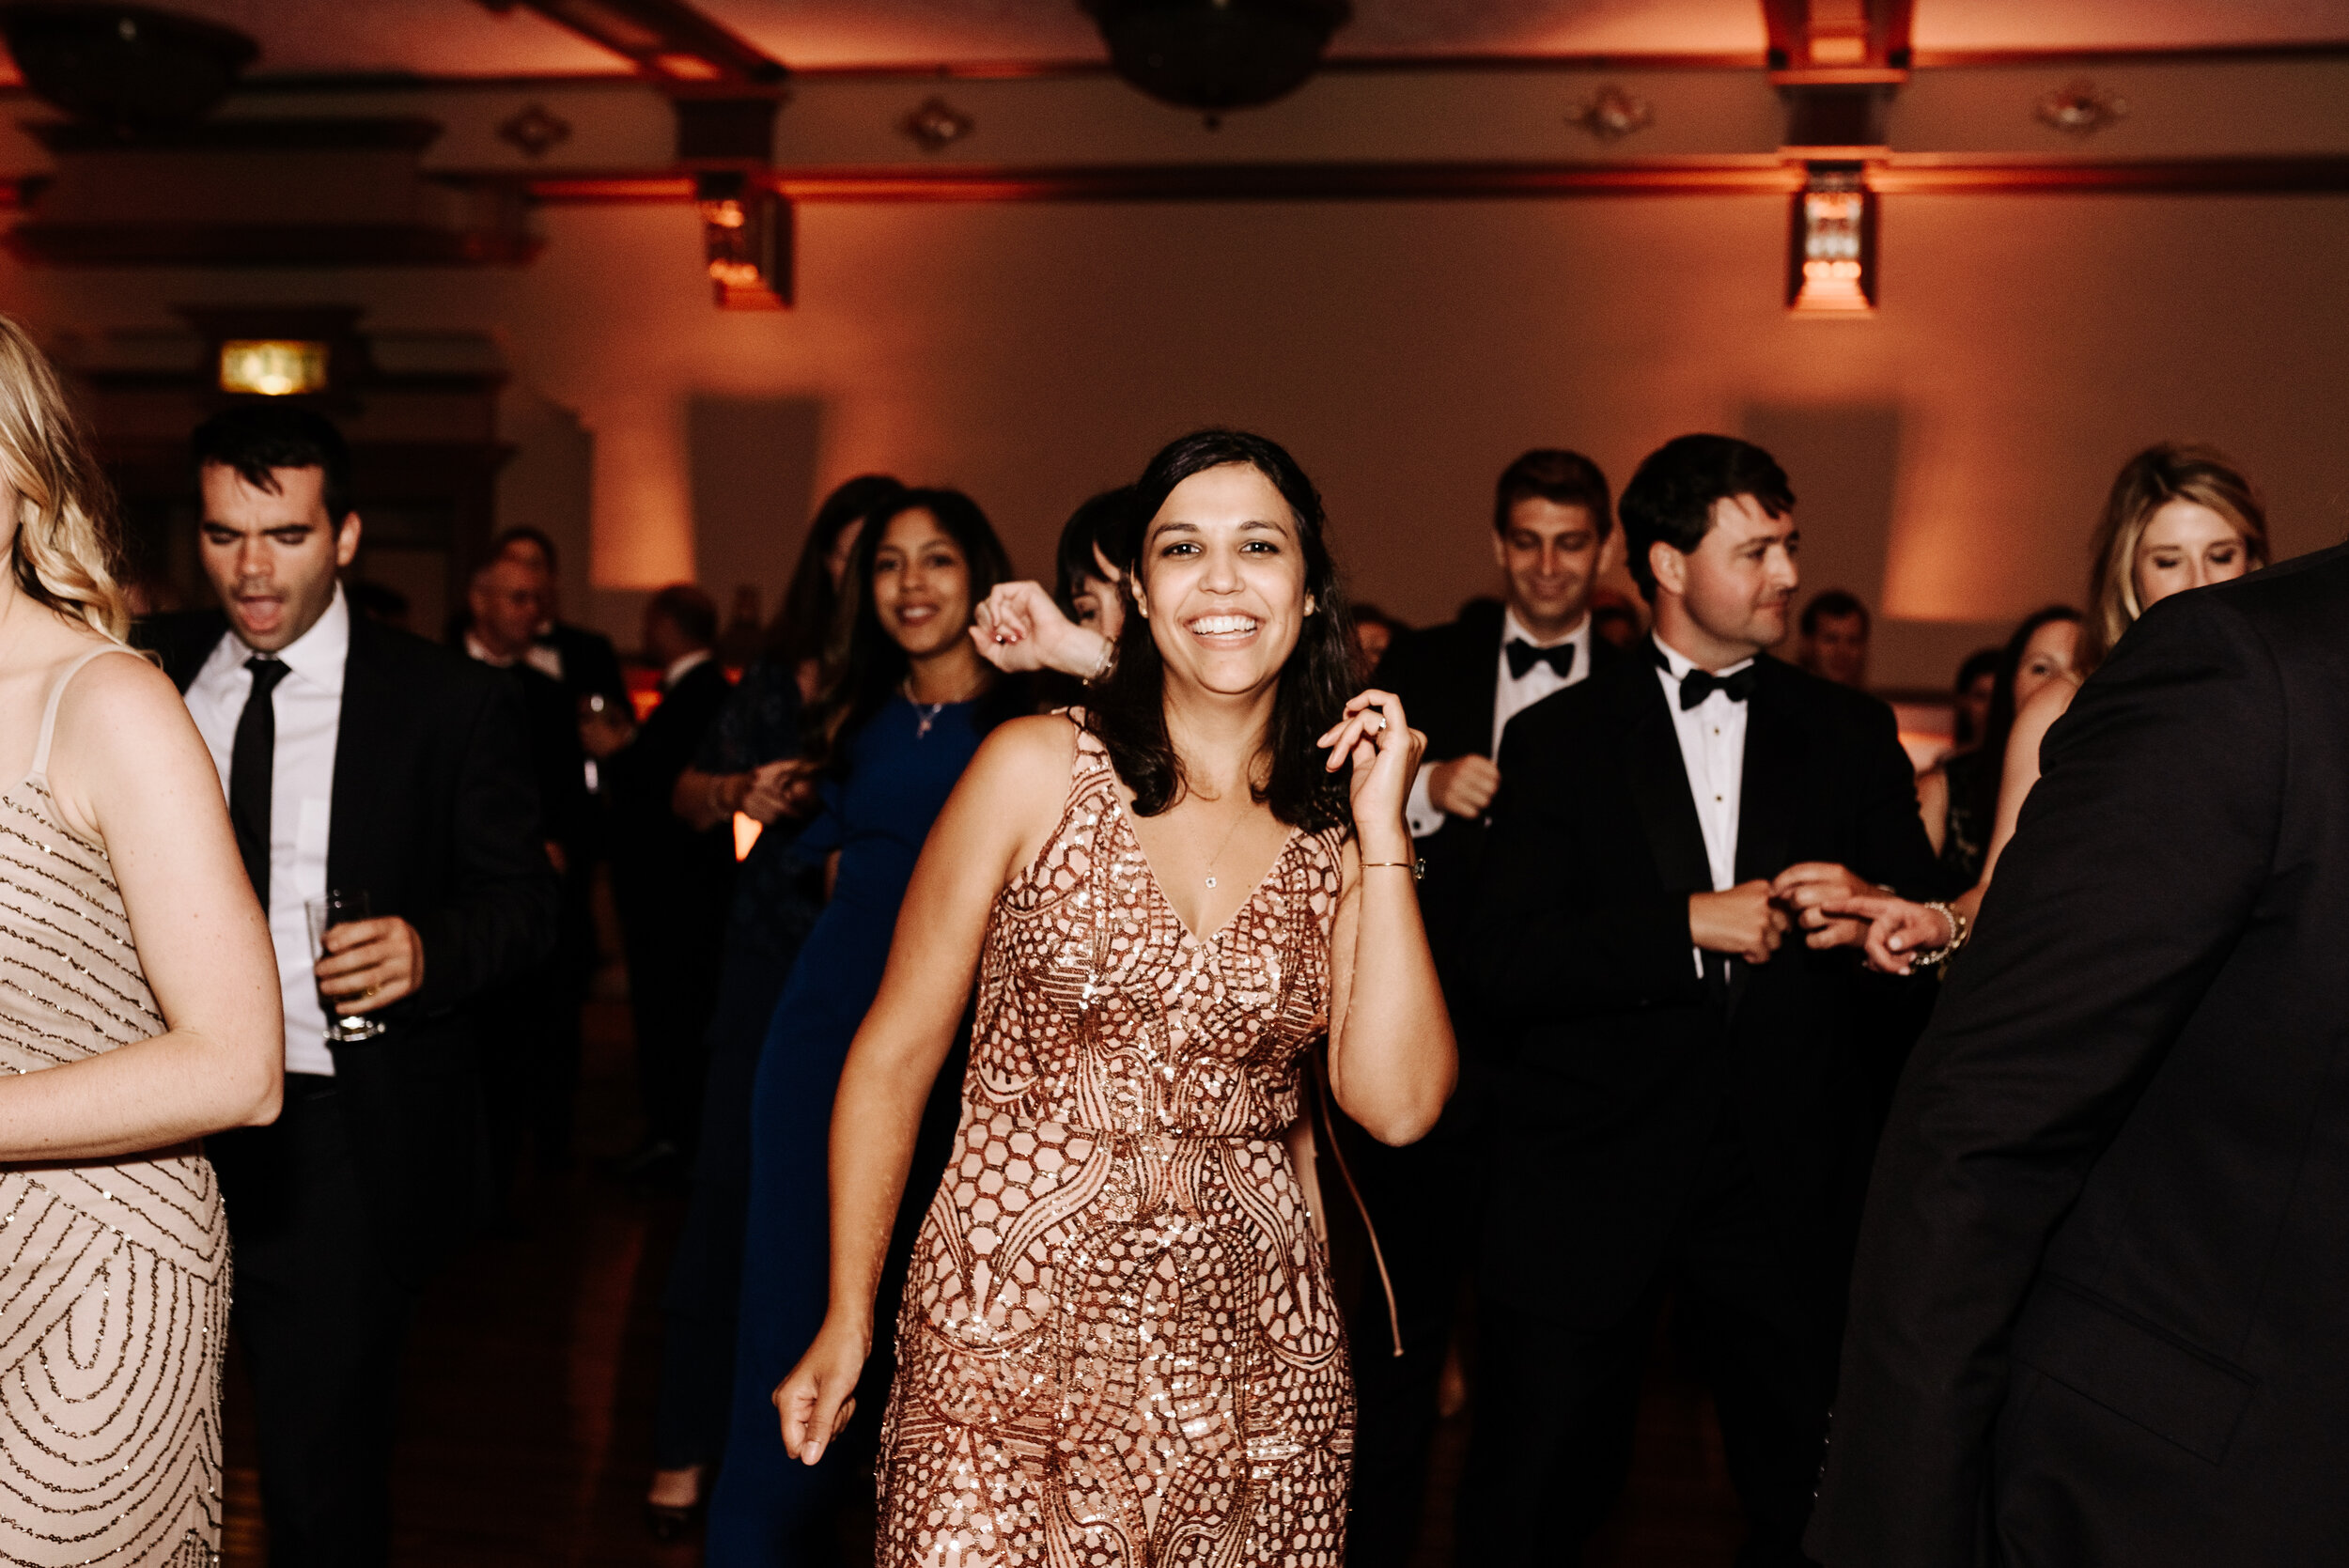 Cassie-Mrunal-Wedding-Quirk-Hotel-John-Marshall-Ballrooms-Richmond-Virginia-Photography-by-V-108.jpg